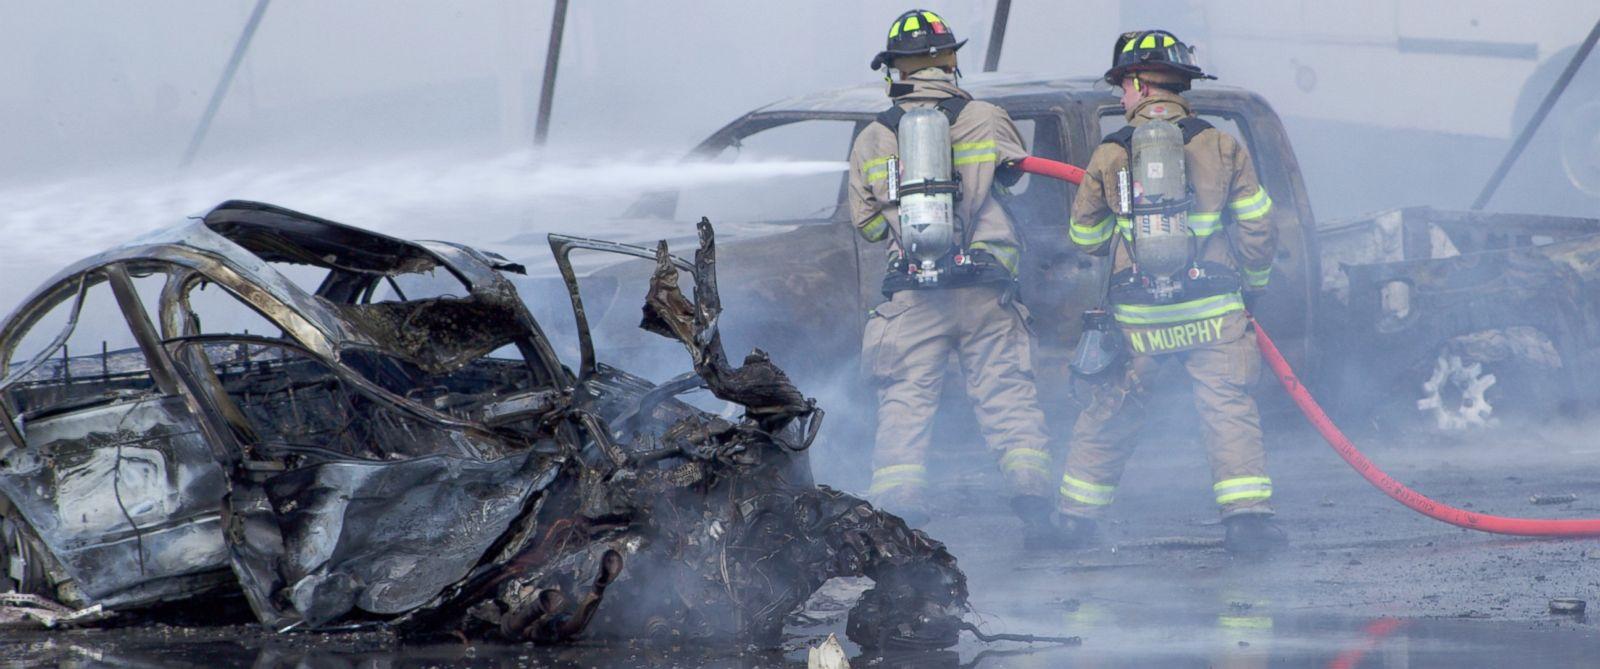 teterboro plane crash.jpg